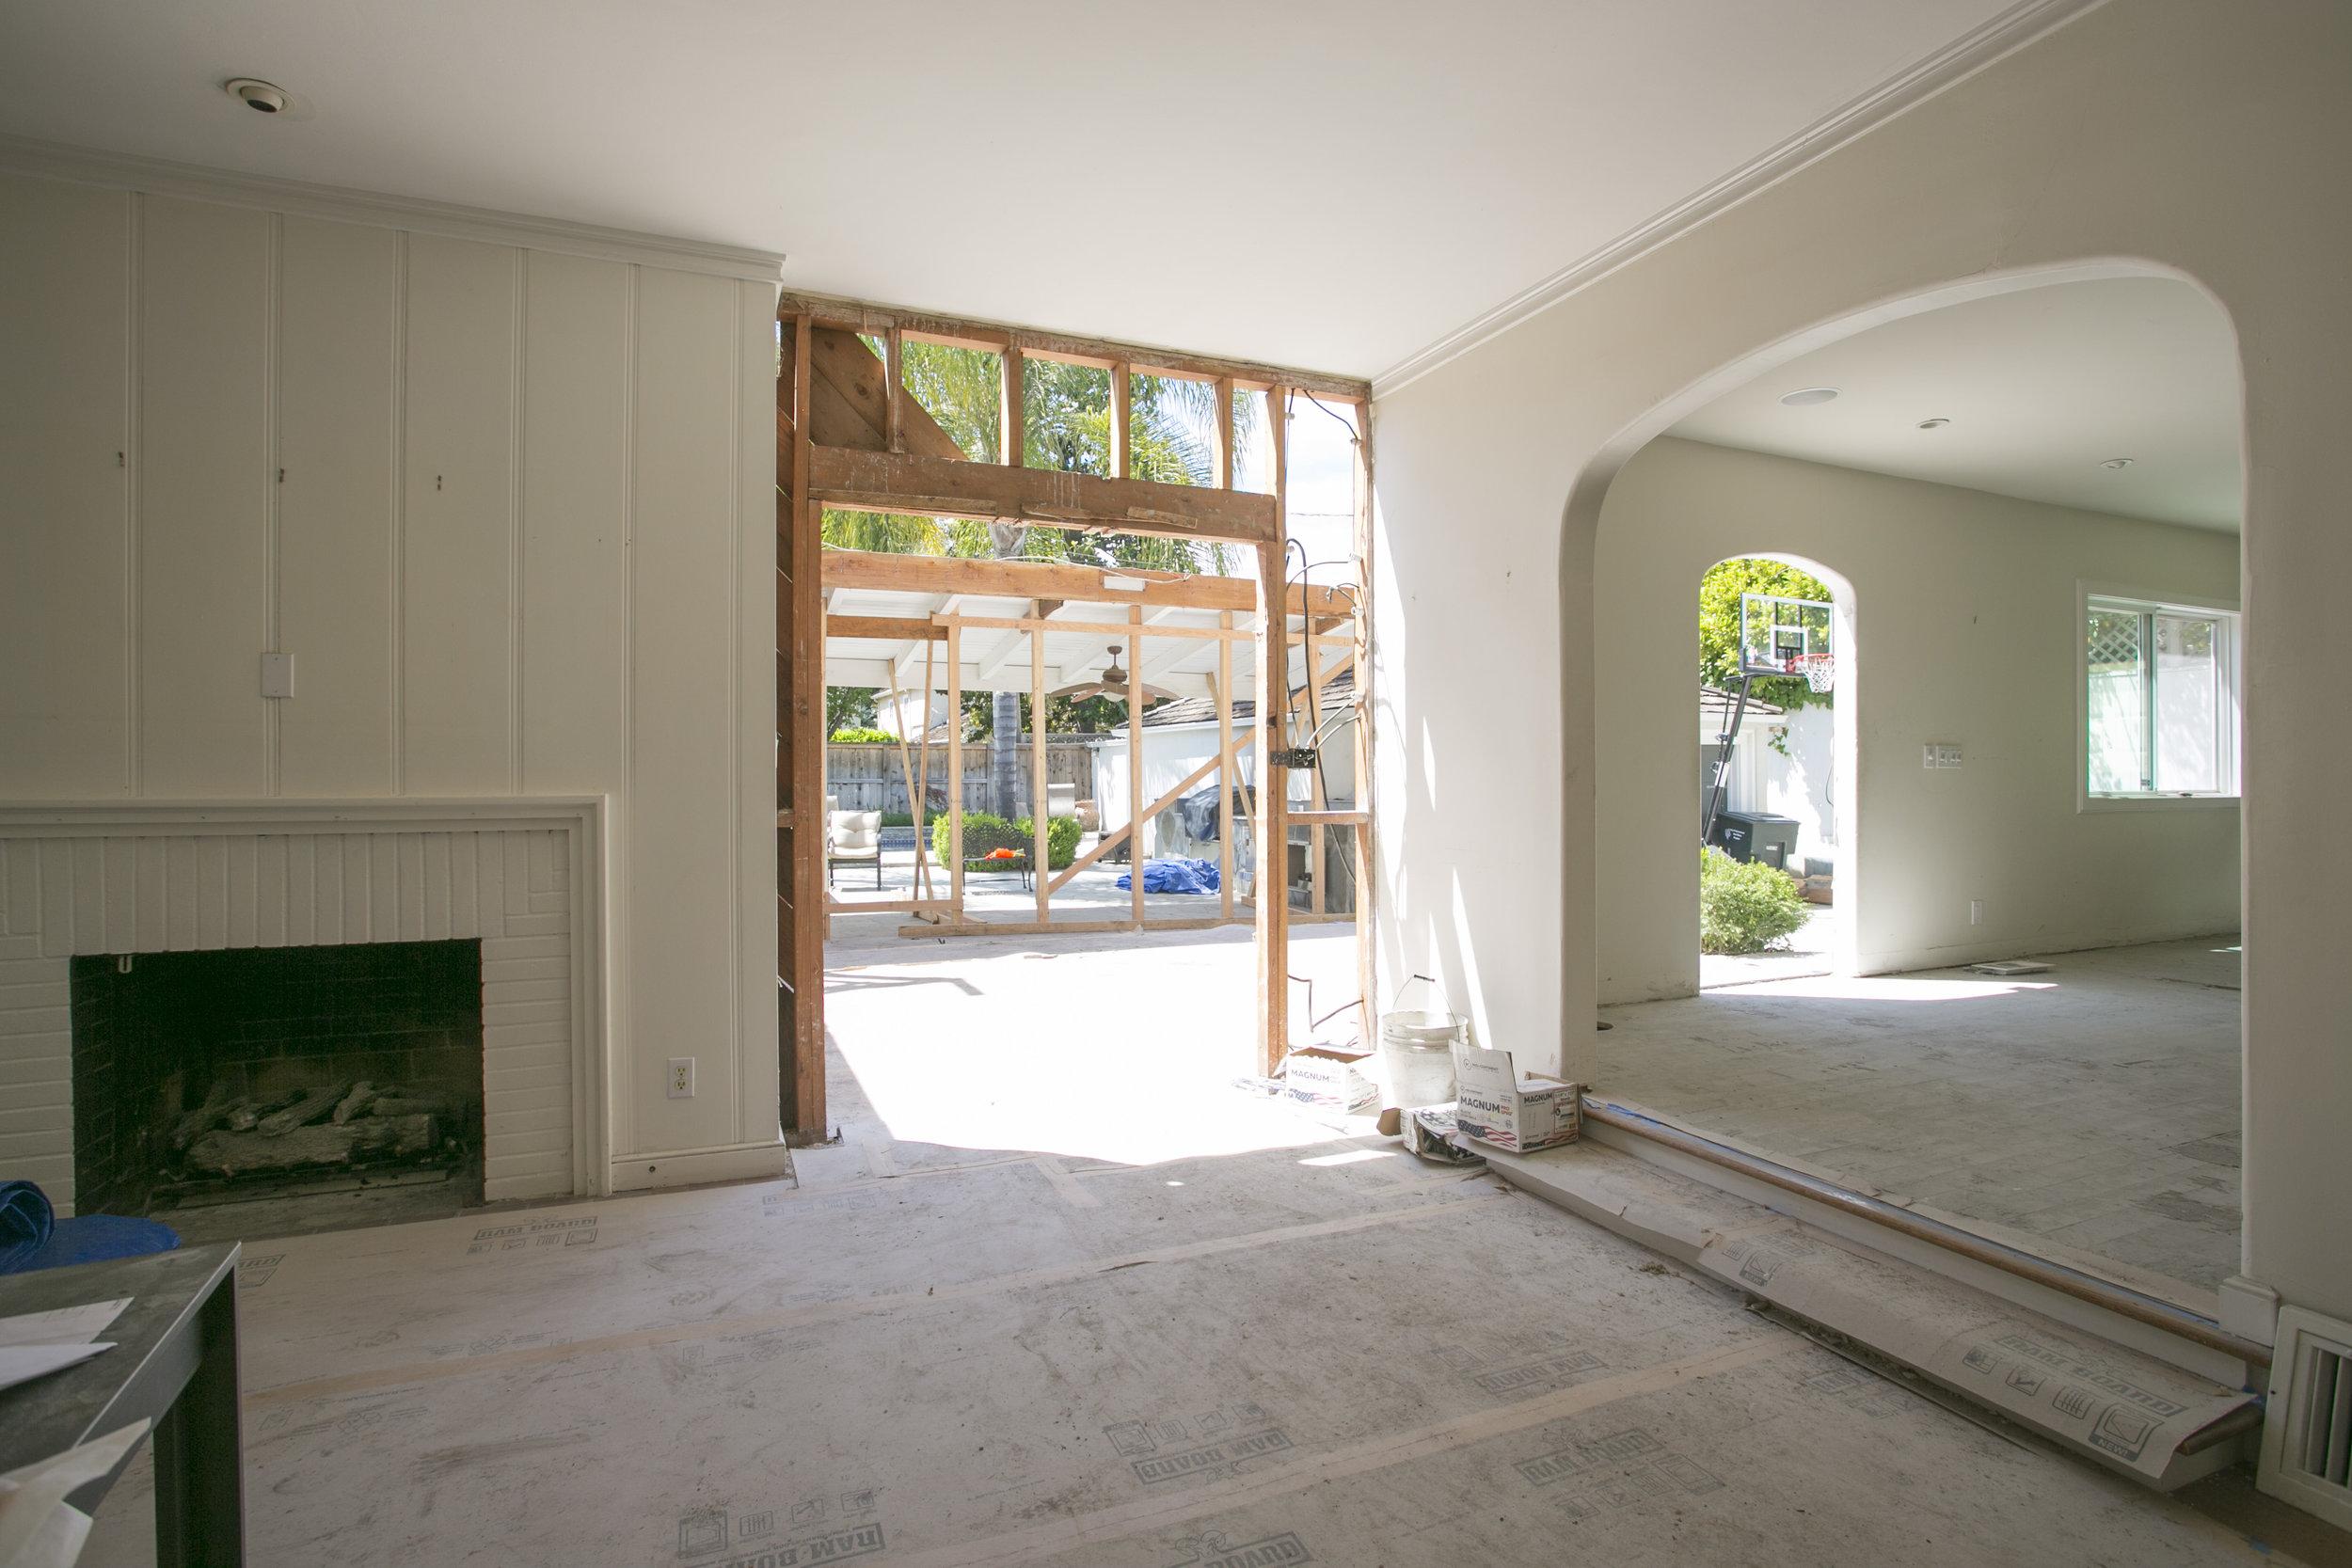 2-story-master-suite-addition-interior.jpg